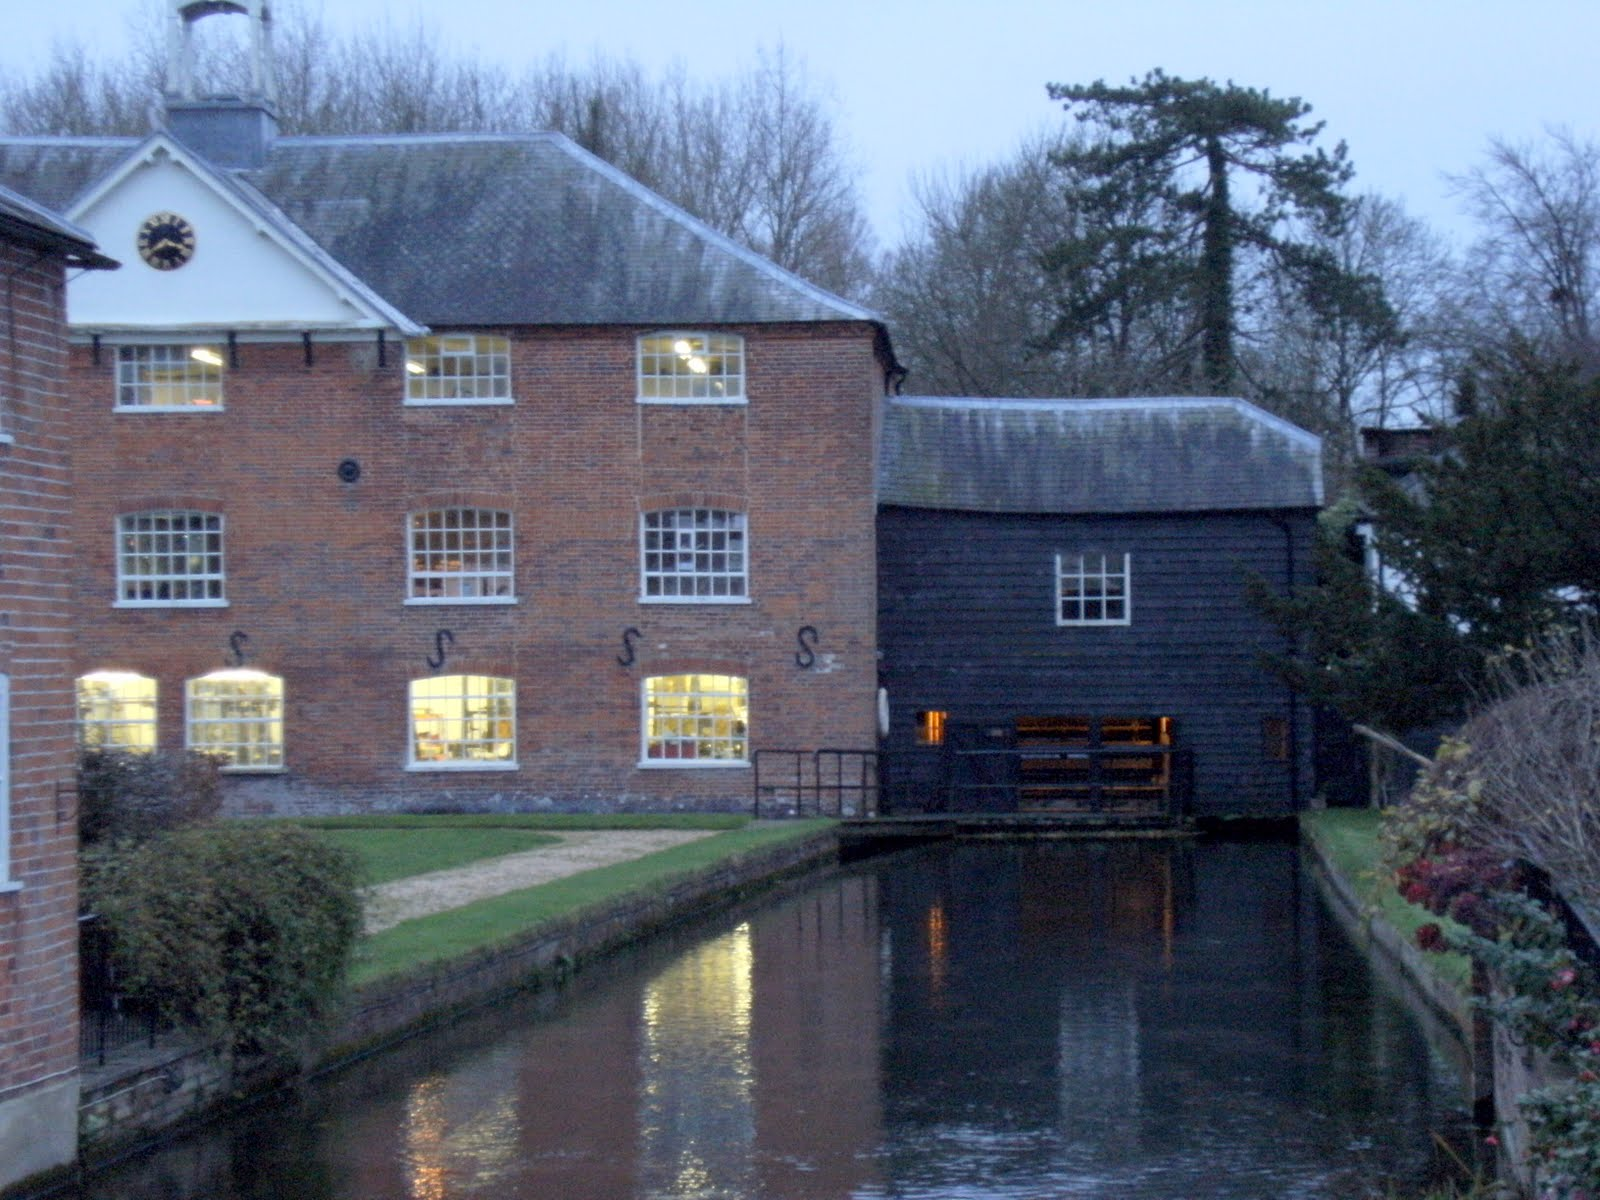 DSCF2730 Whitchurch Silk Mill